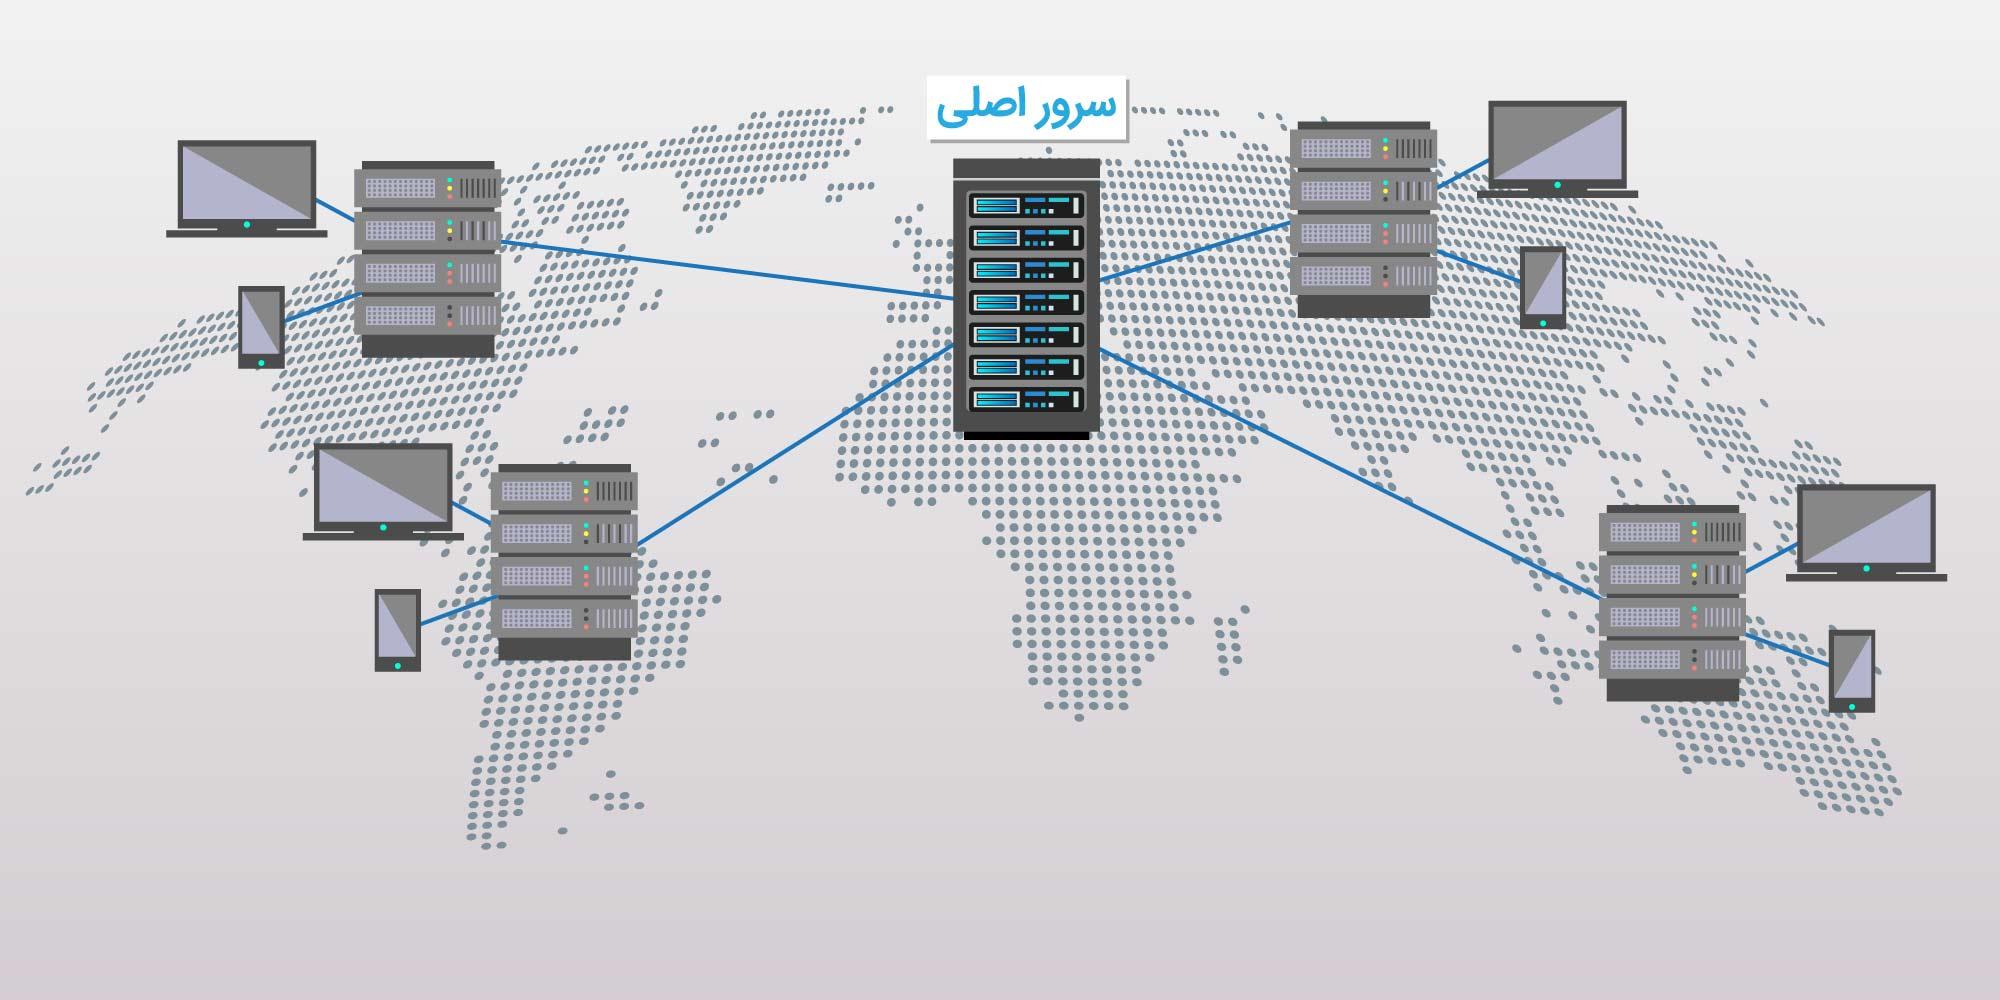 شبکه توزیع محتوا (CDN)